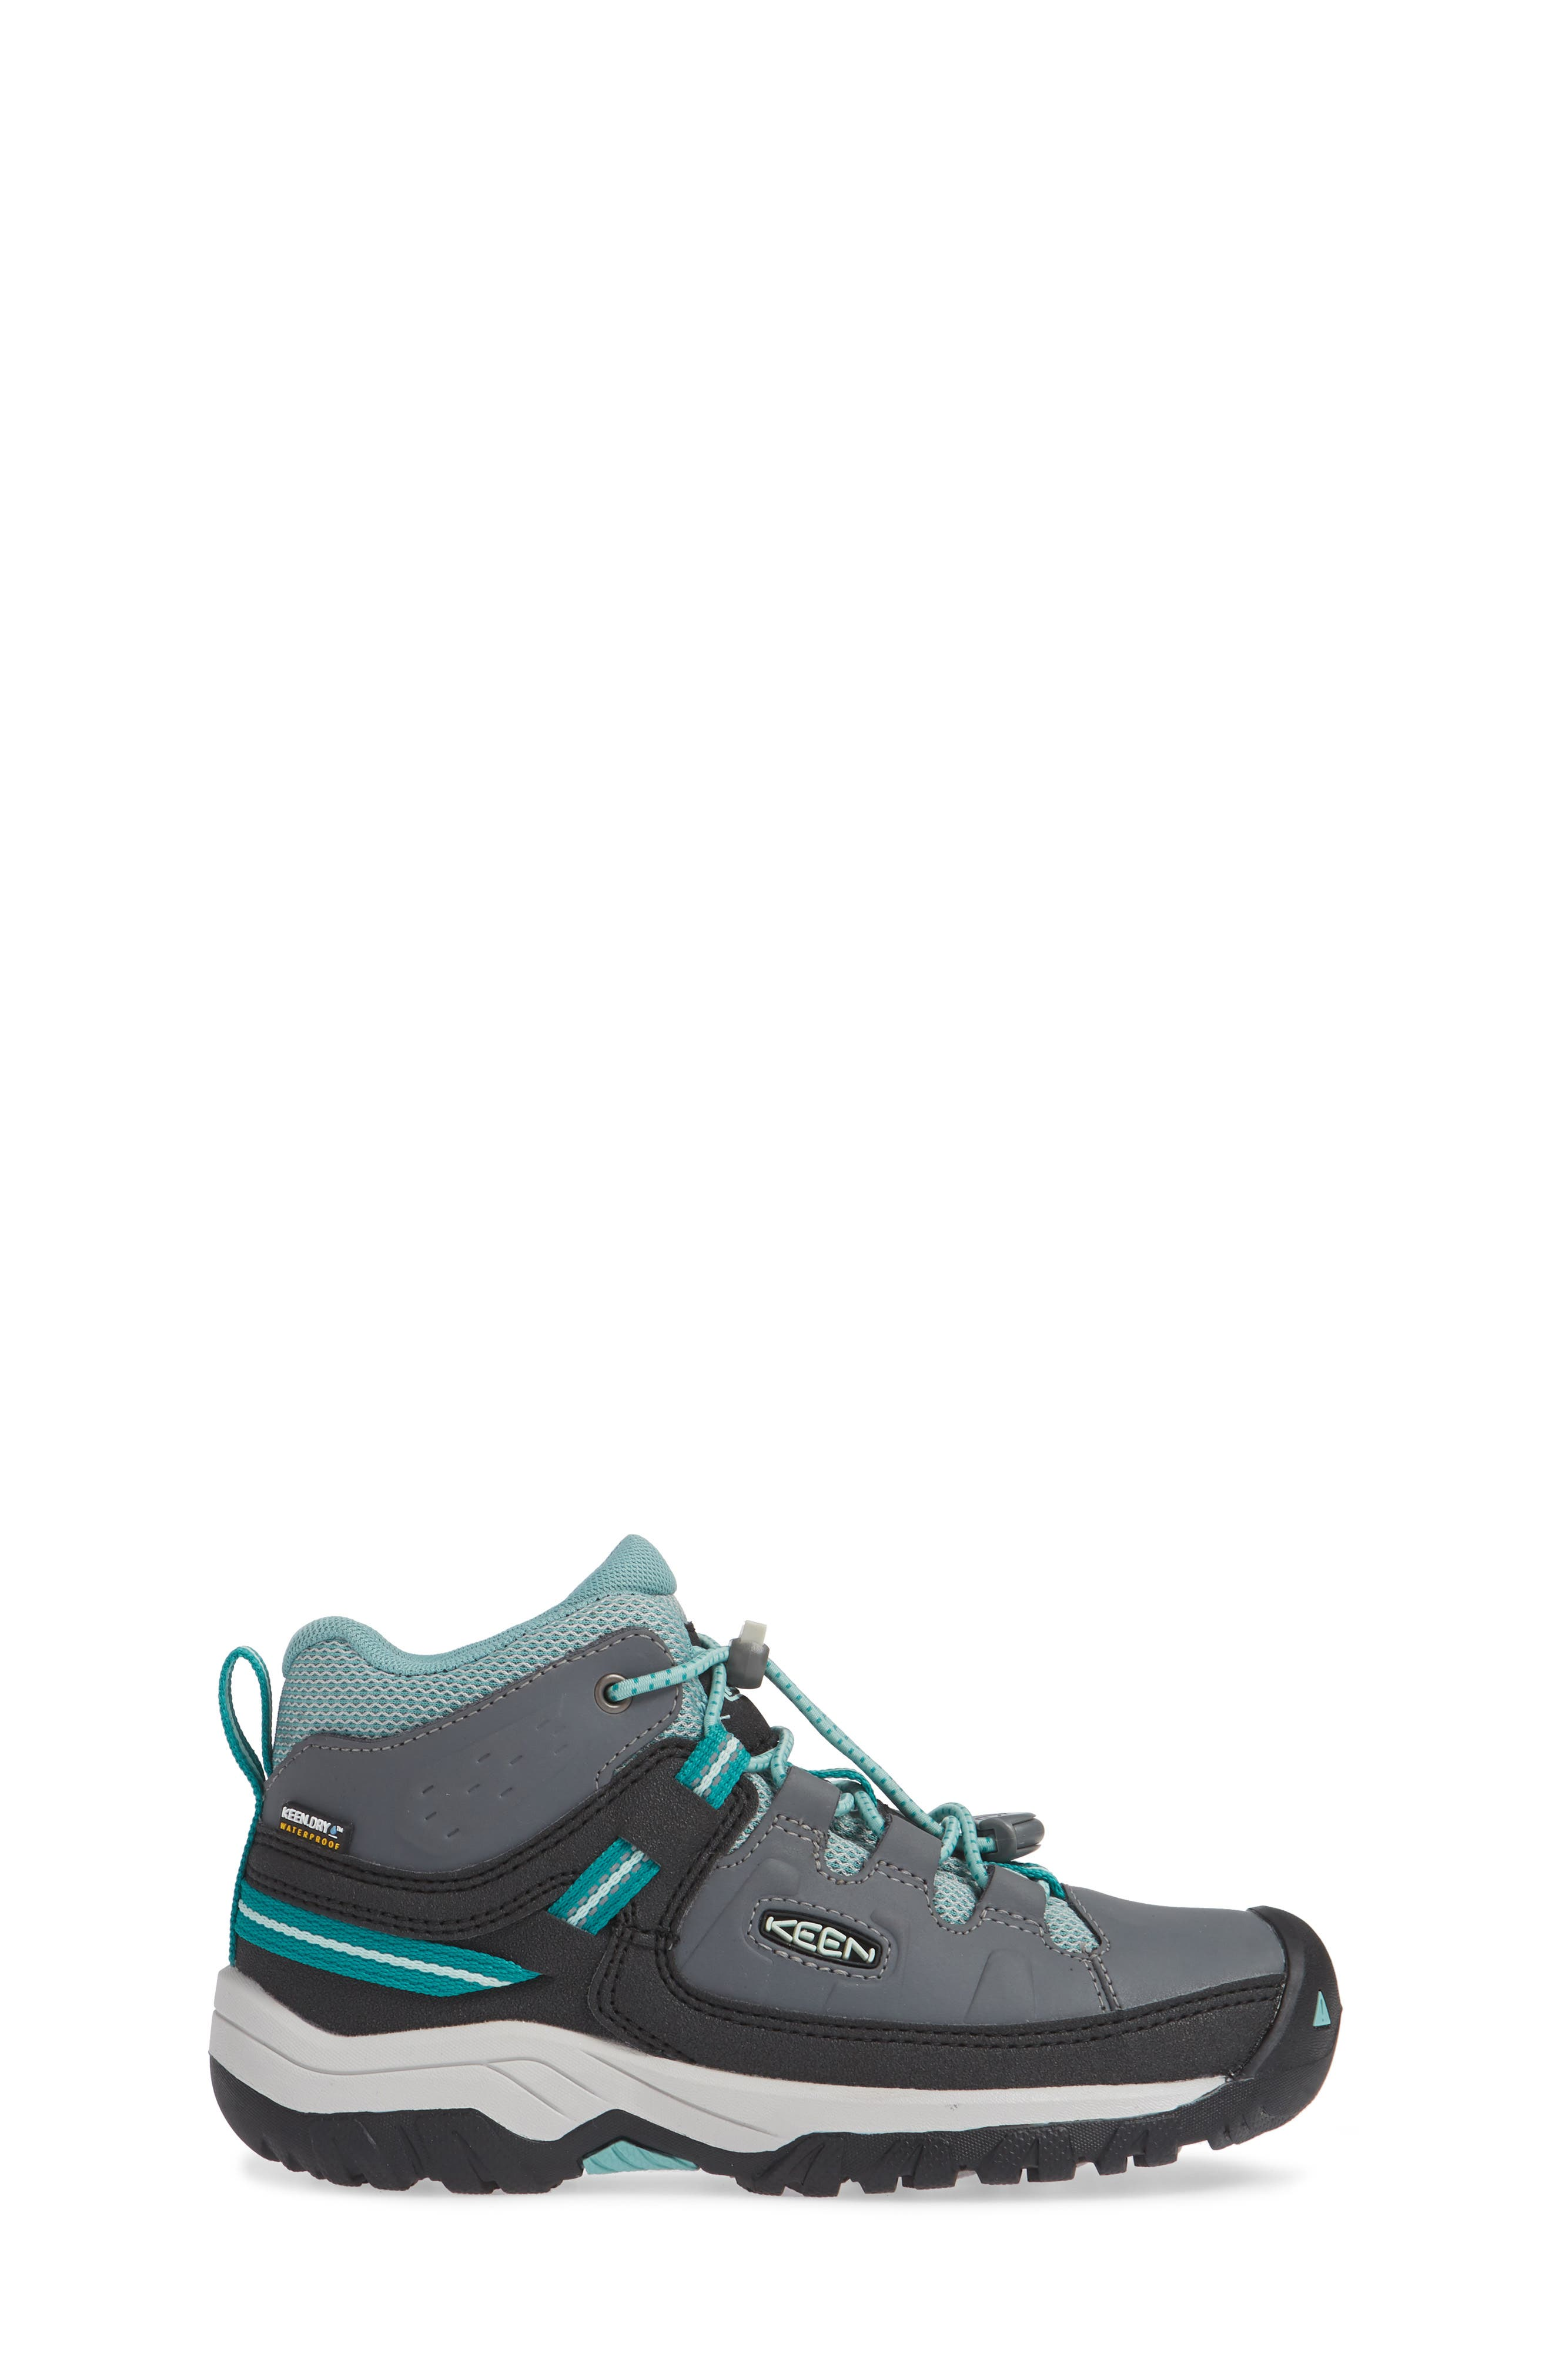 Targhee Mid Waterproof Hiking Boot,                             Alternate thumbnail 3, color,                             GREY/ WASABI